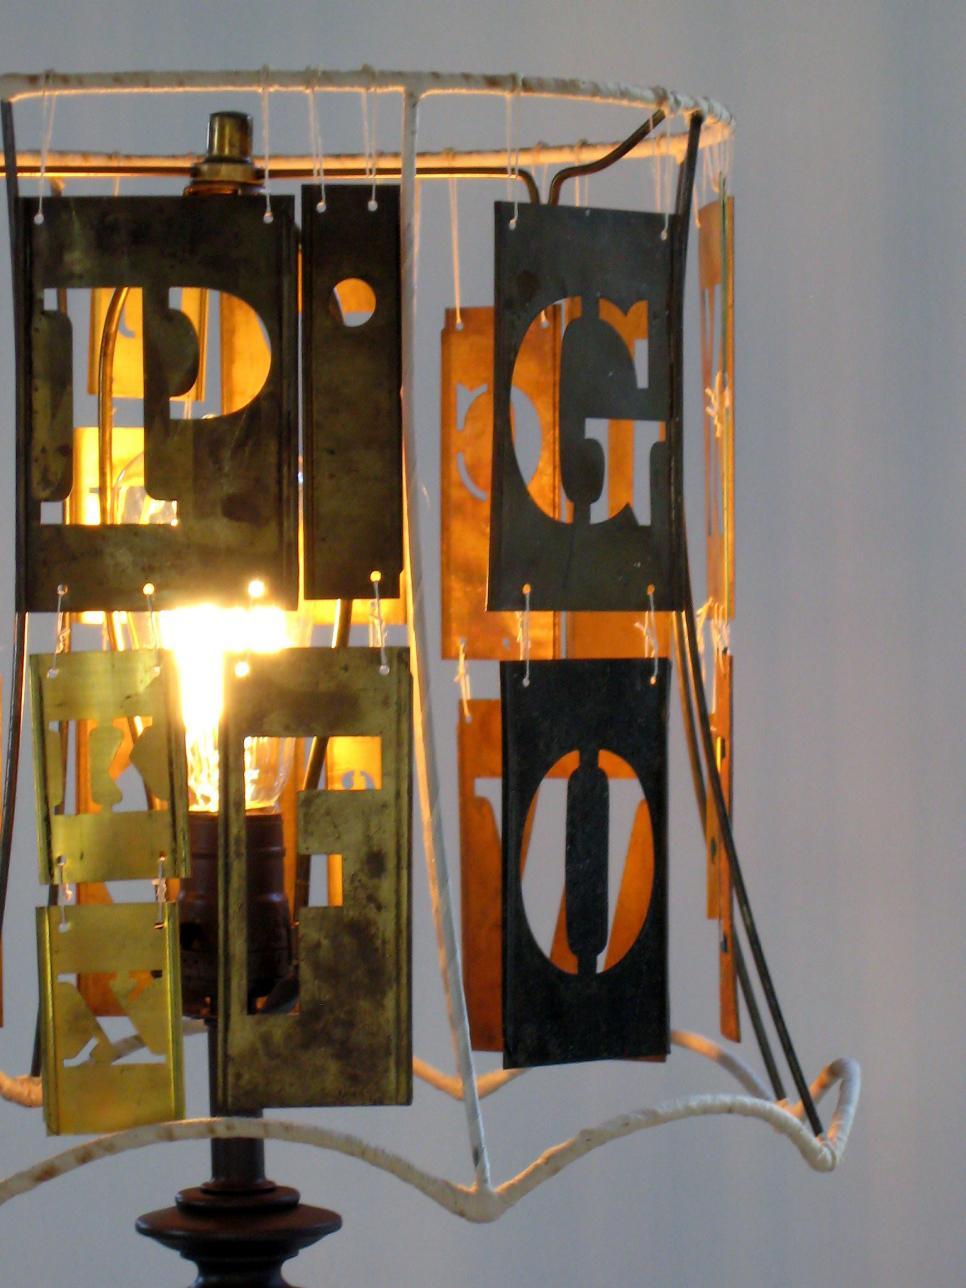 Transform Your Bedroom With DIY Decor | HGTV